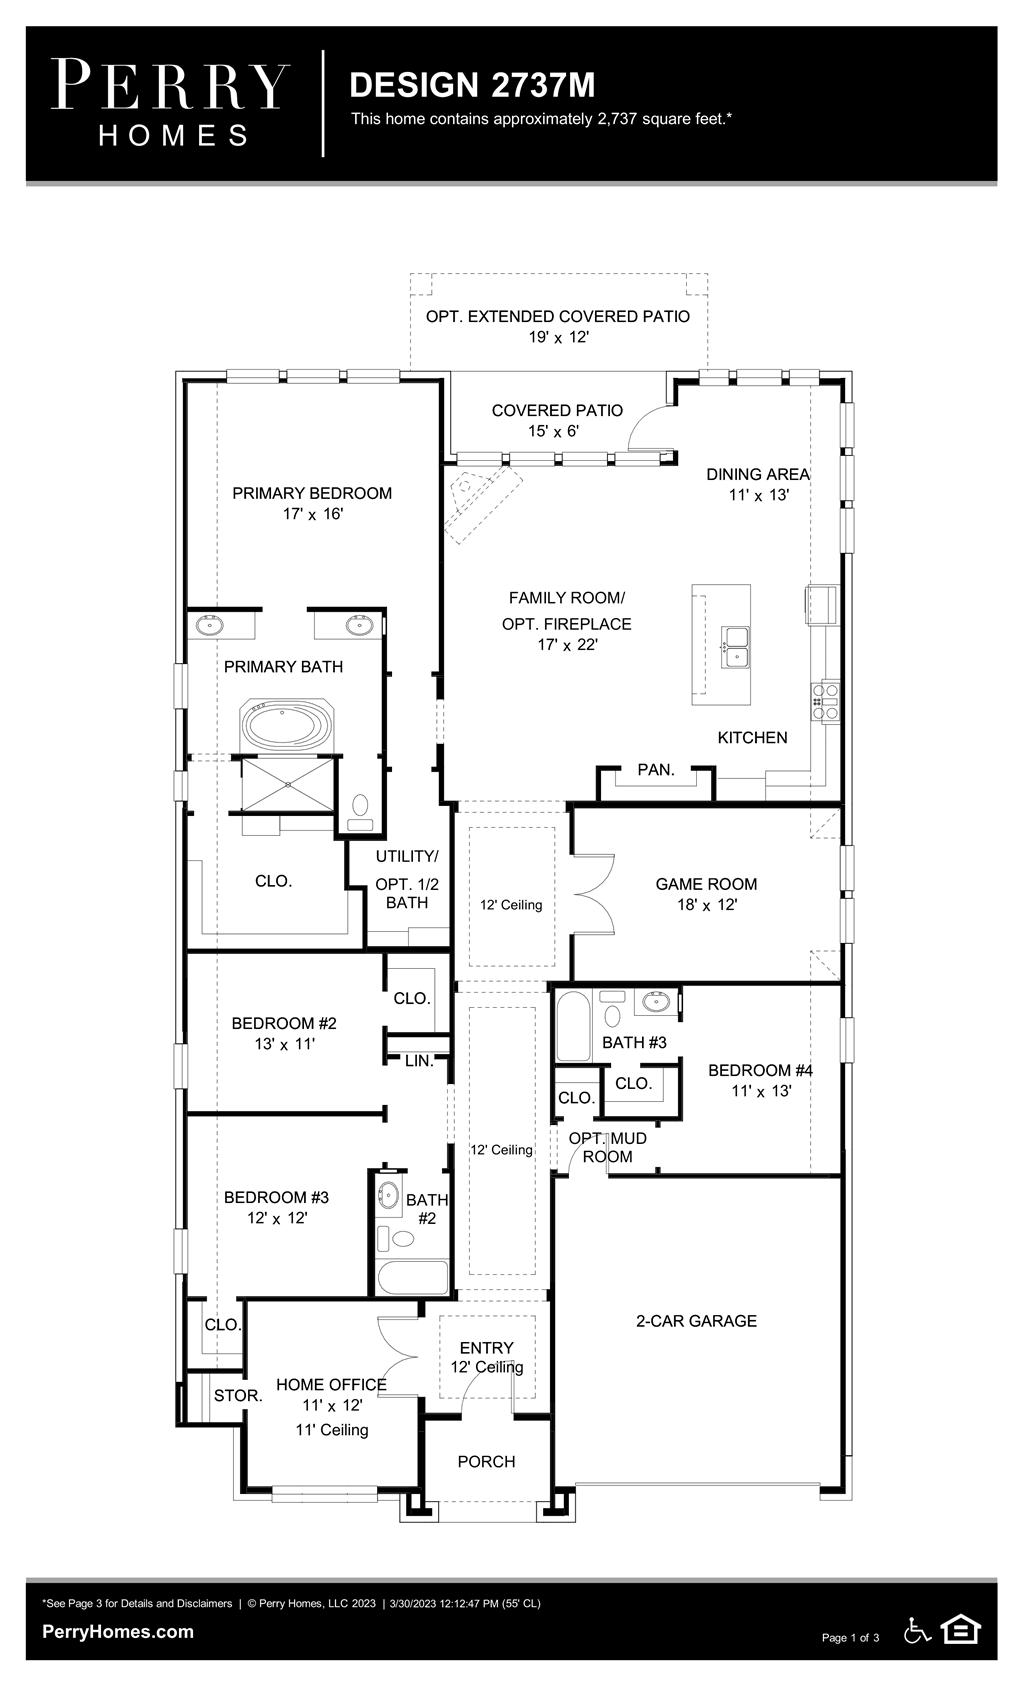 Floor Plan for 2737M